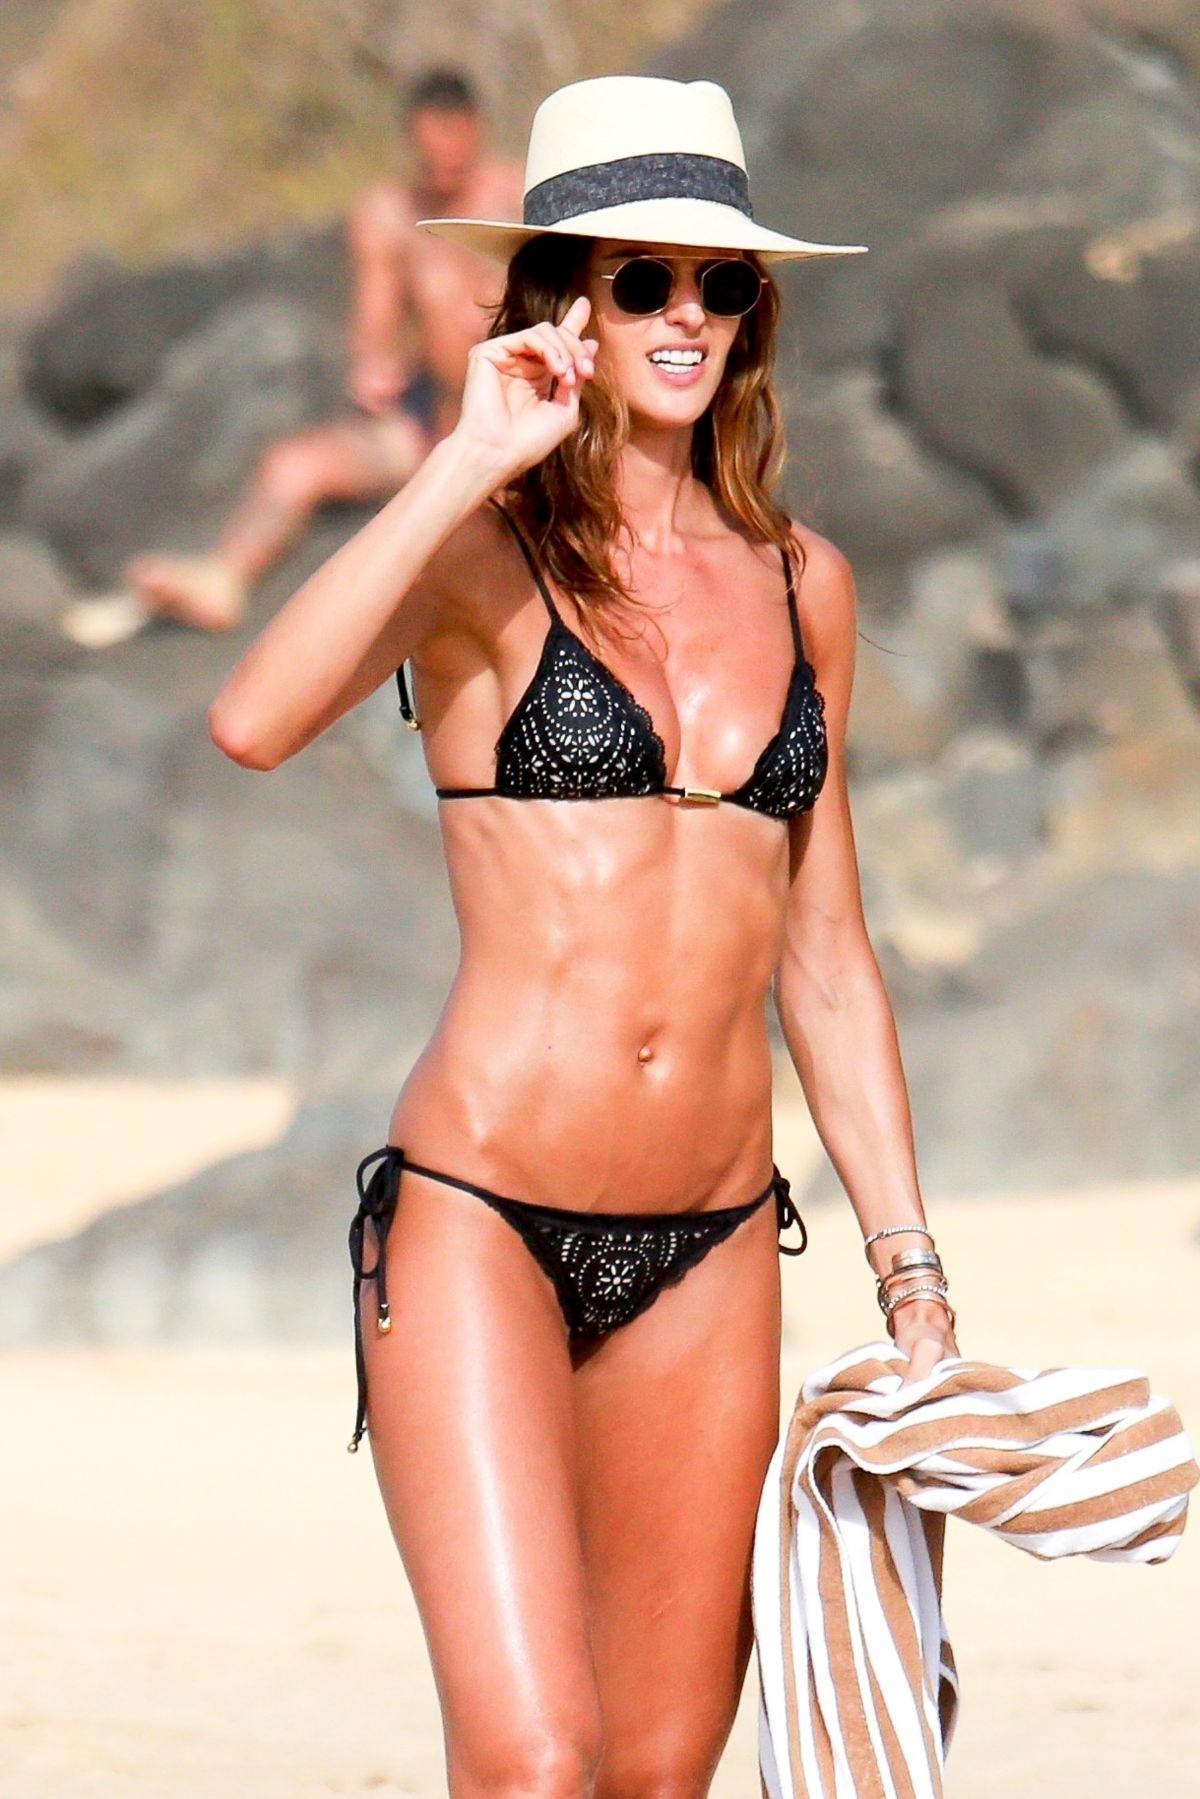 Izabel Goulart in Bikini and Kevin Trapp on the beach in Fernando de Noronha Pic 26 of 35